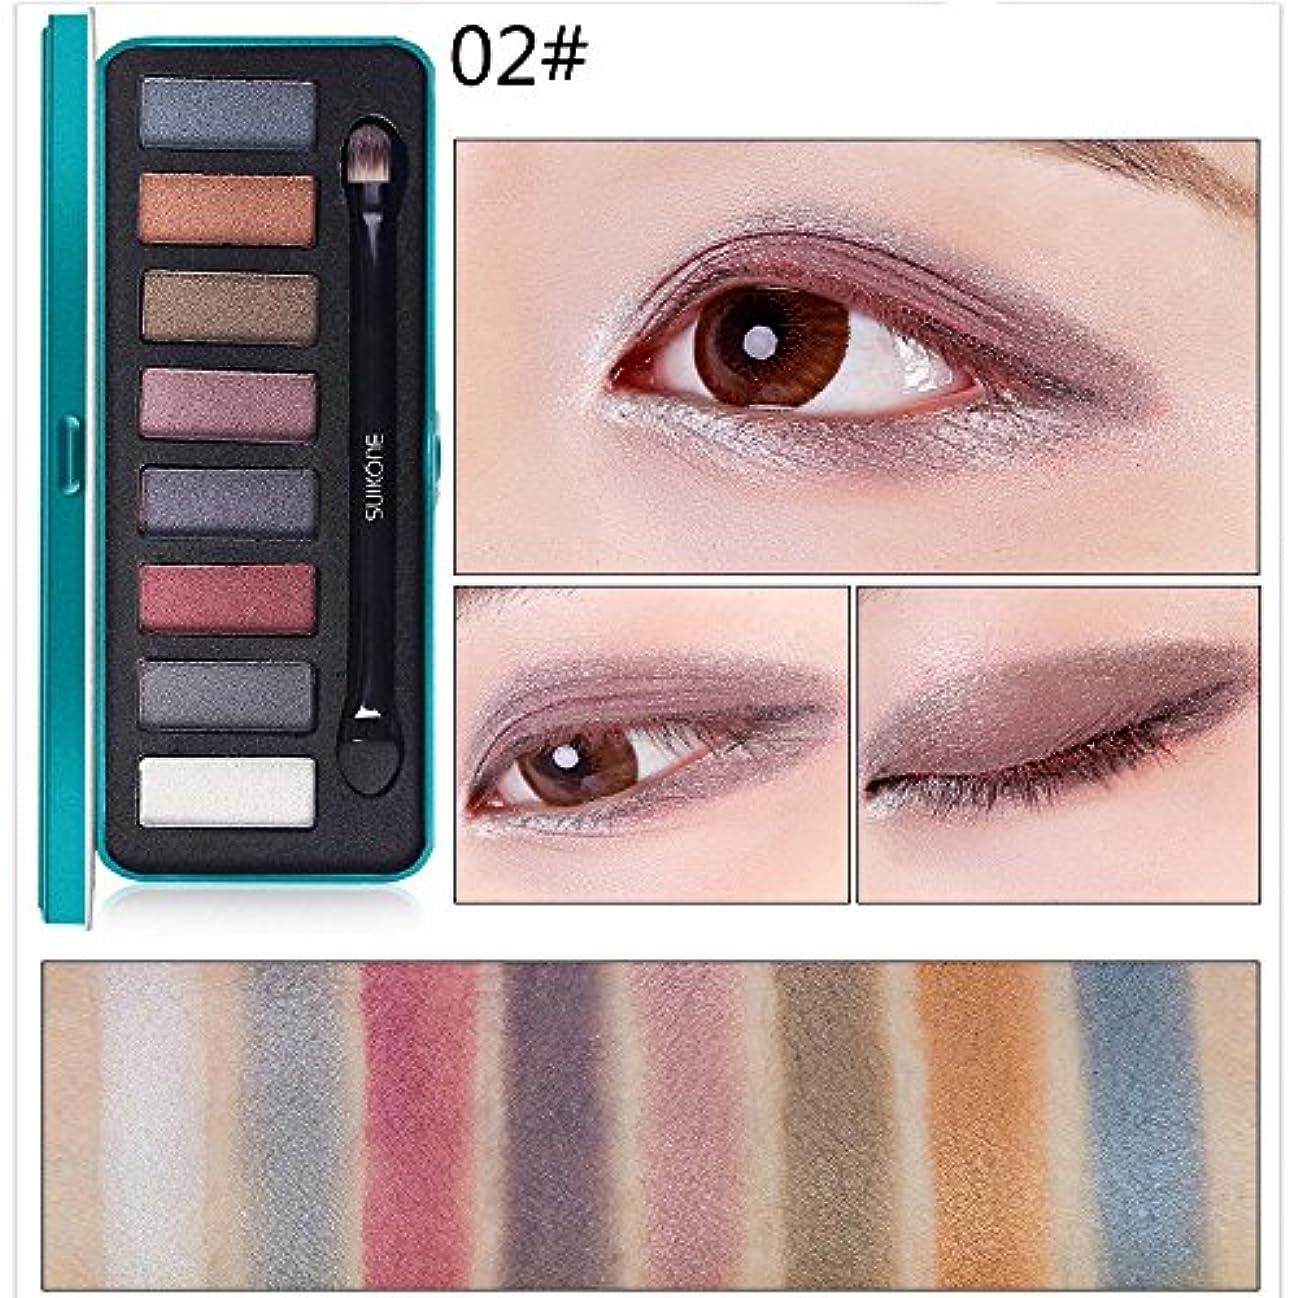 Akane アイシャドウパレット Suikone ファッション 人気 気質的 綺麗 メタルボックス 魅力的 チャーム 防水 長持ち おしゃれ 持ち便利 Eye Shadow (8色)